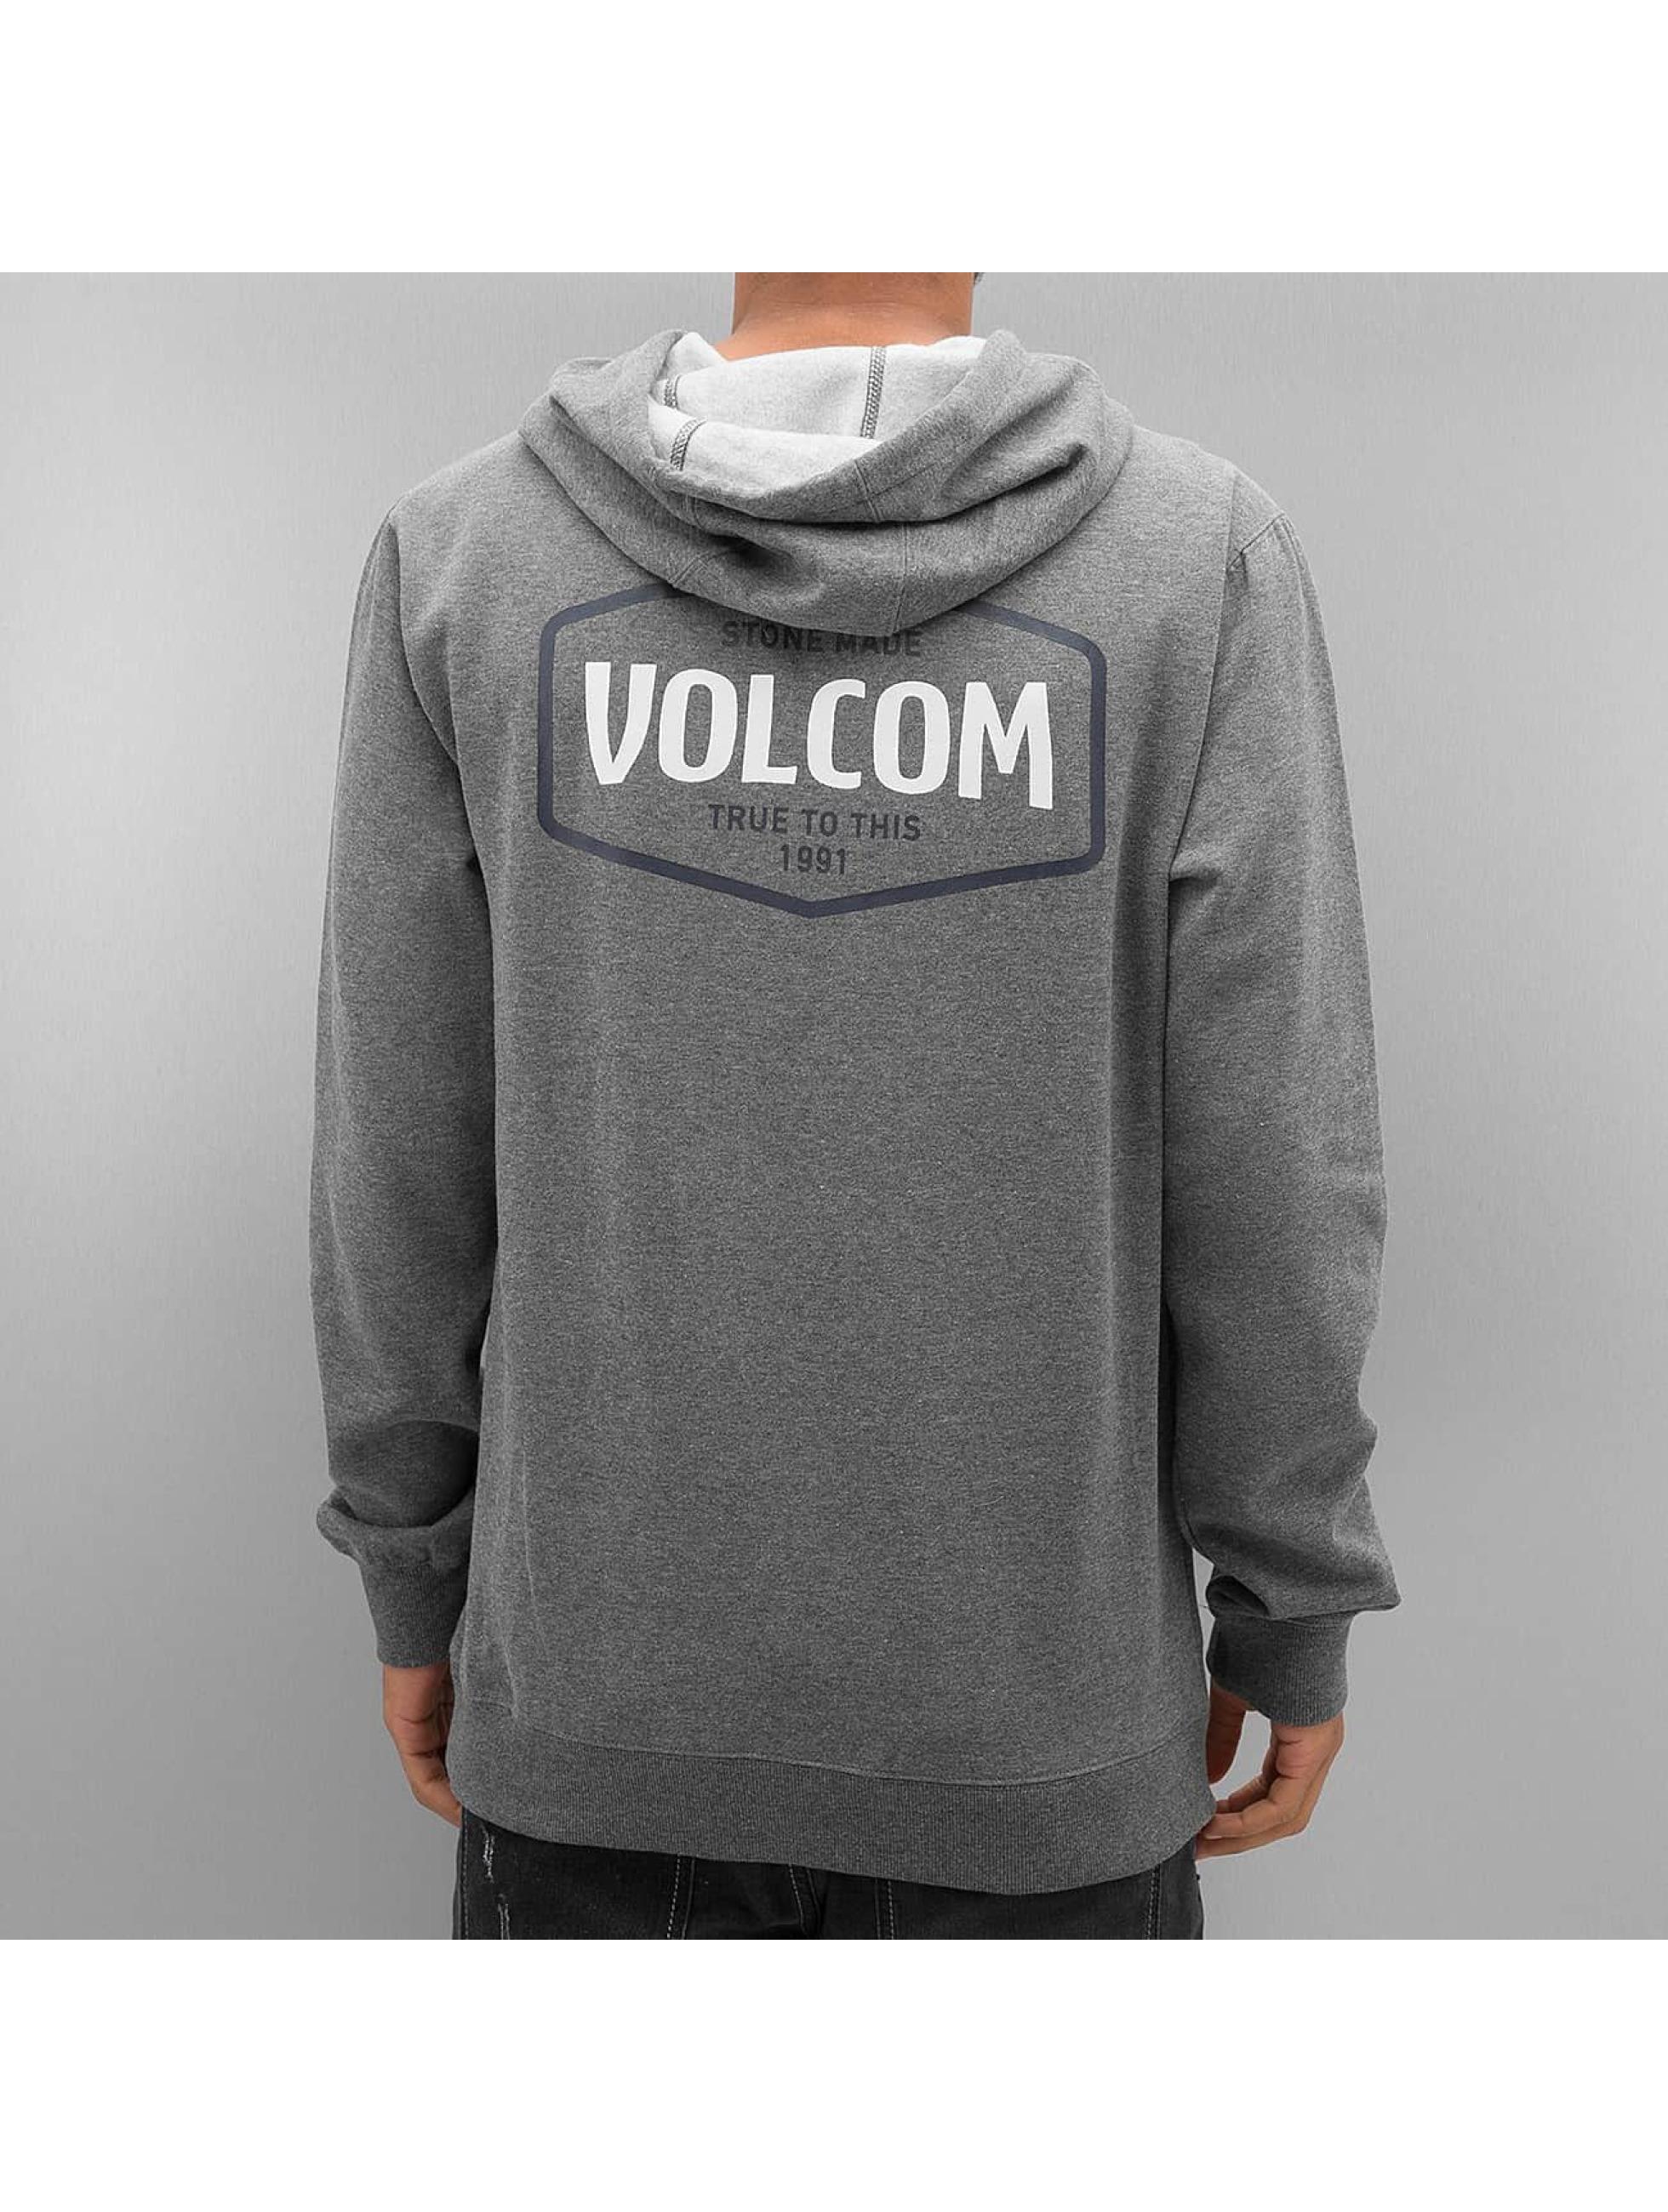 Volcom Hoodie Packsaddle gray